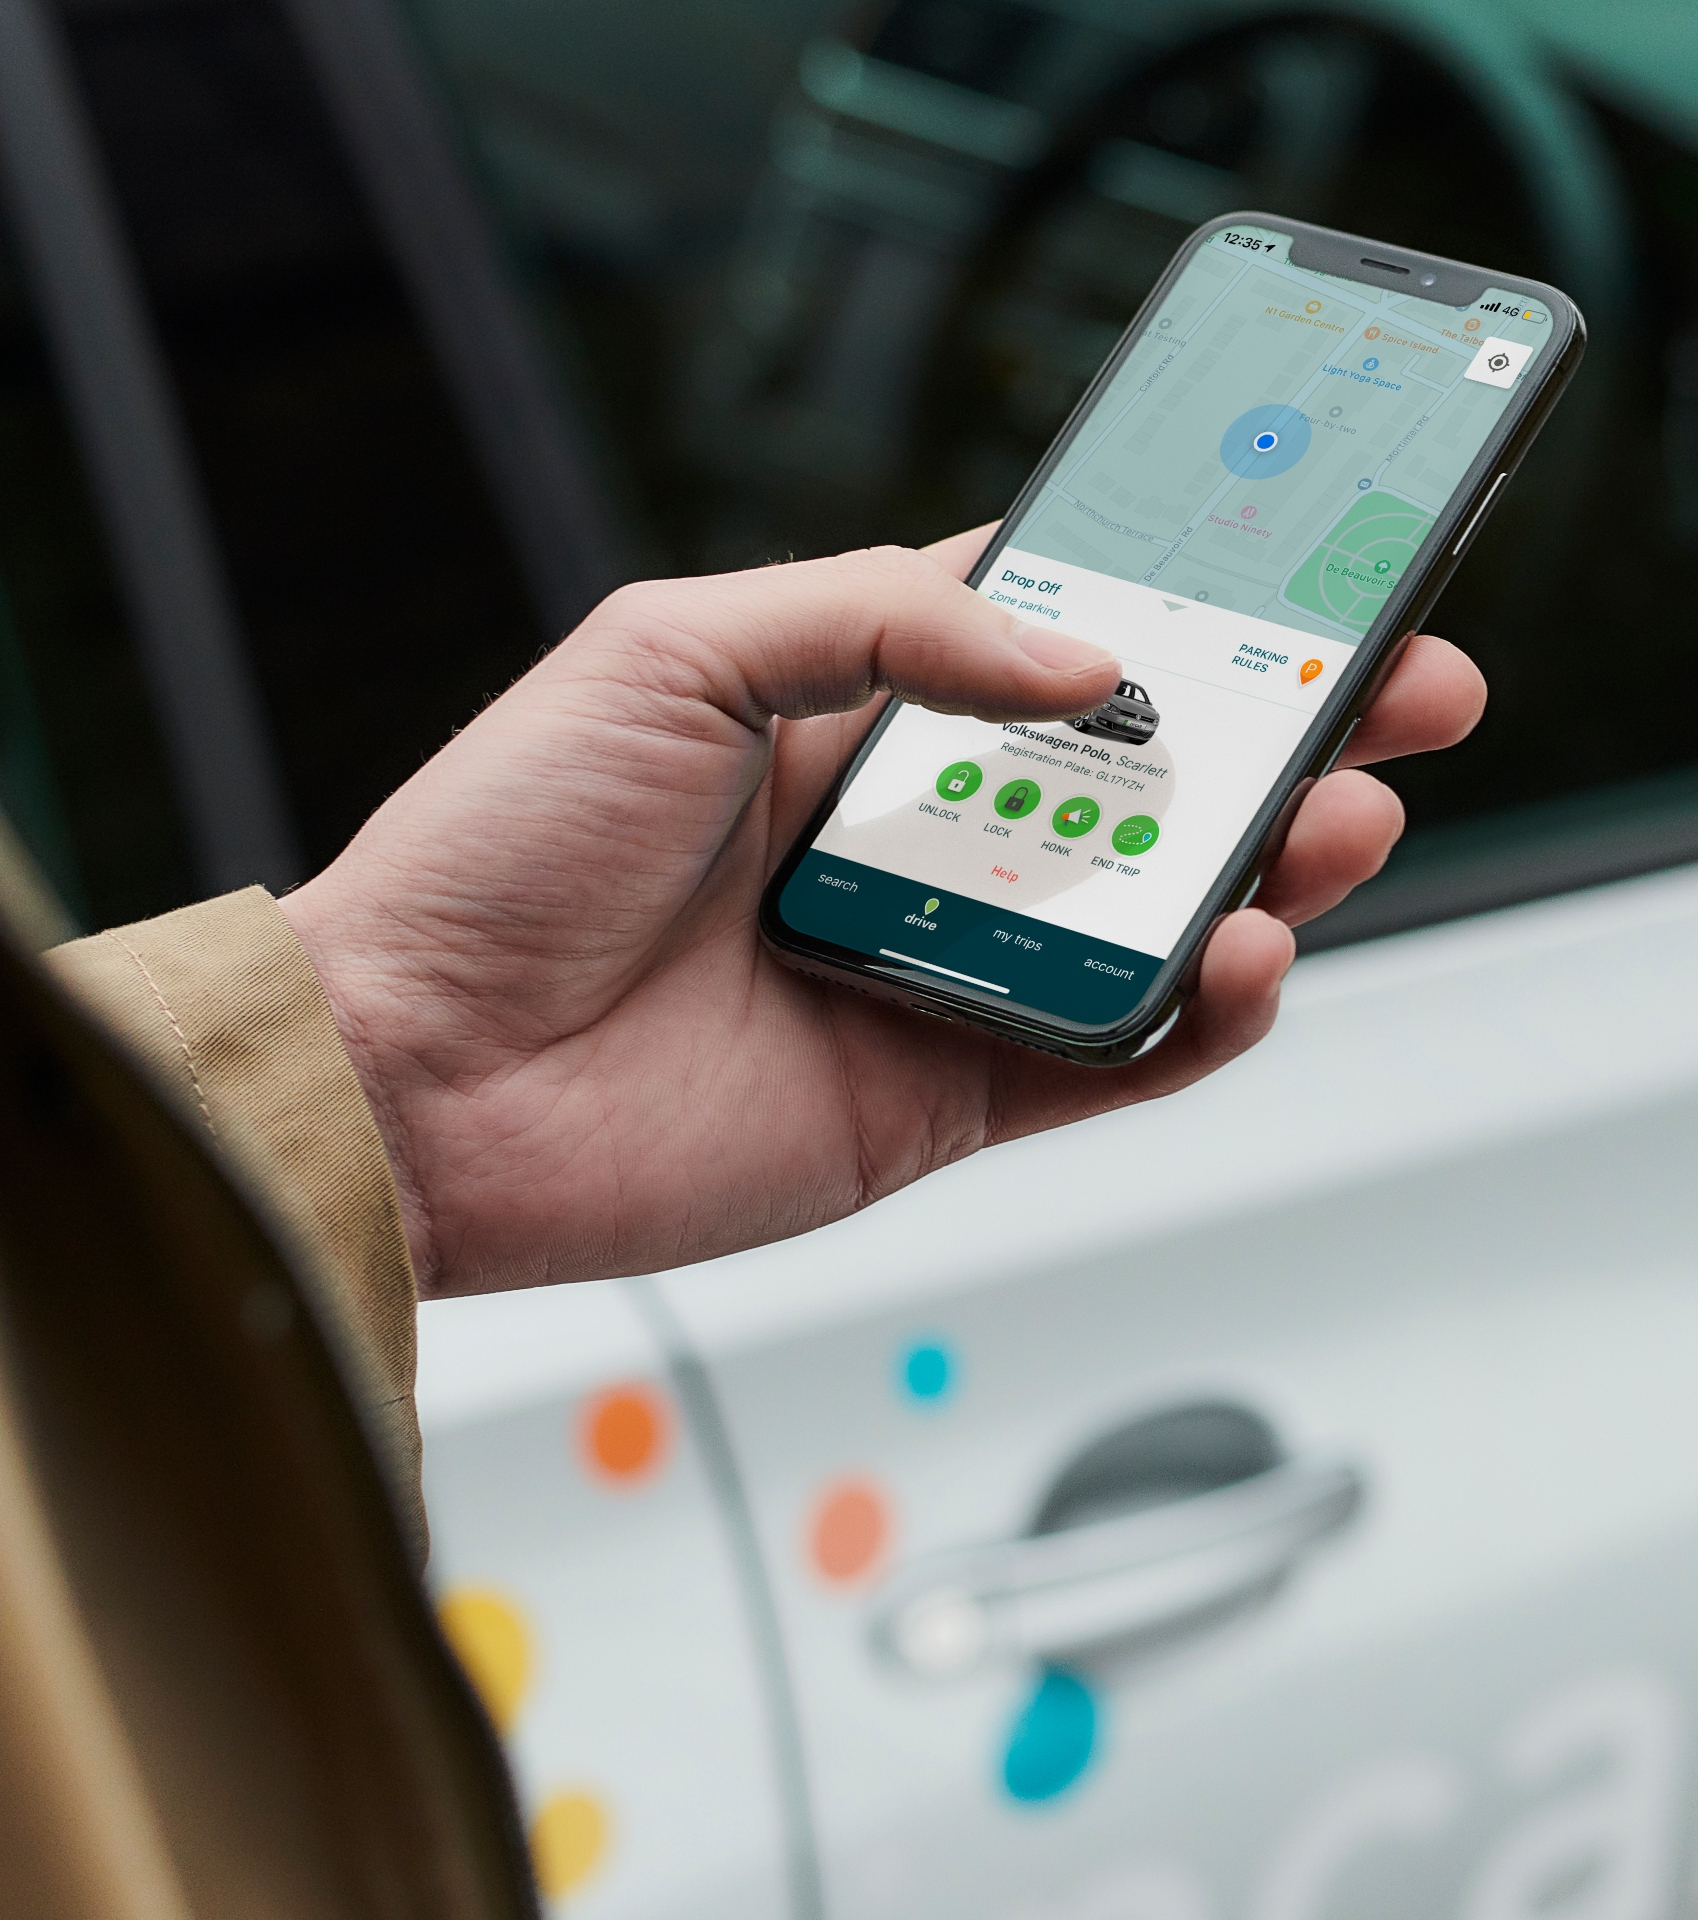 zipcar app in use